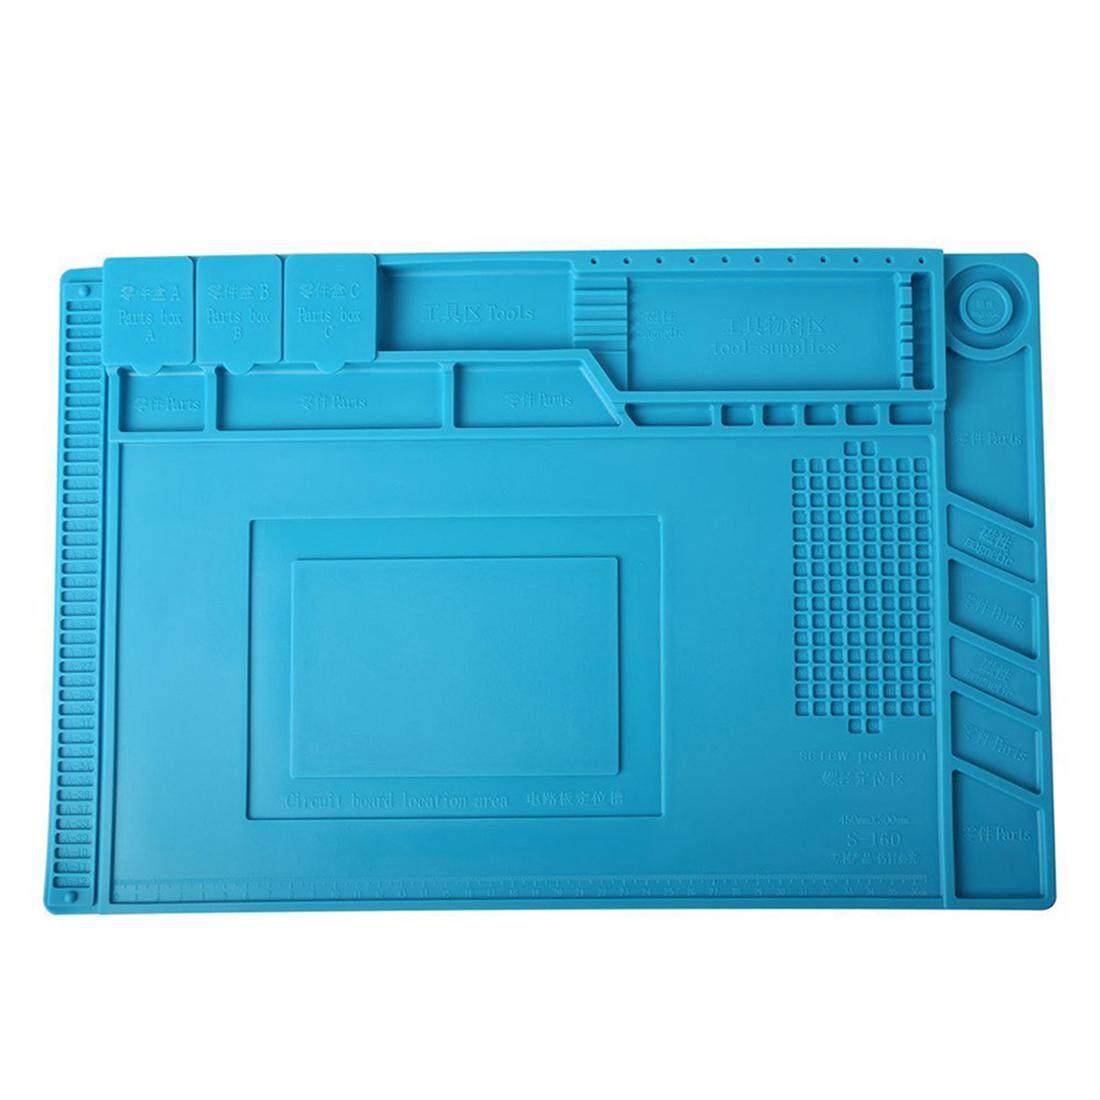 Heat-Resistant Soldering Station Iron Phone PC Computer Repair Mat Magnetic Heat Gun Insulation Silicone Pad Desk Platform